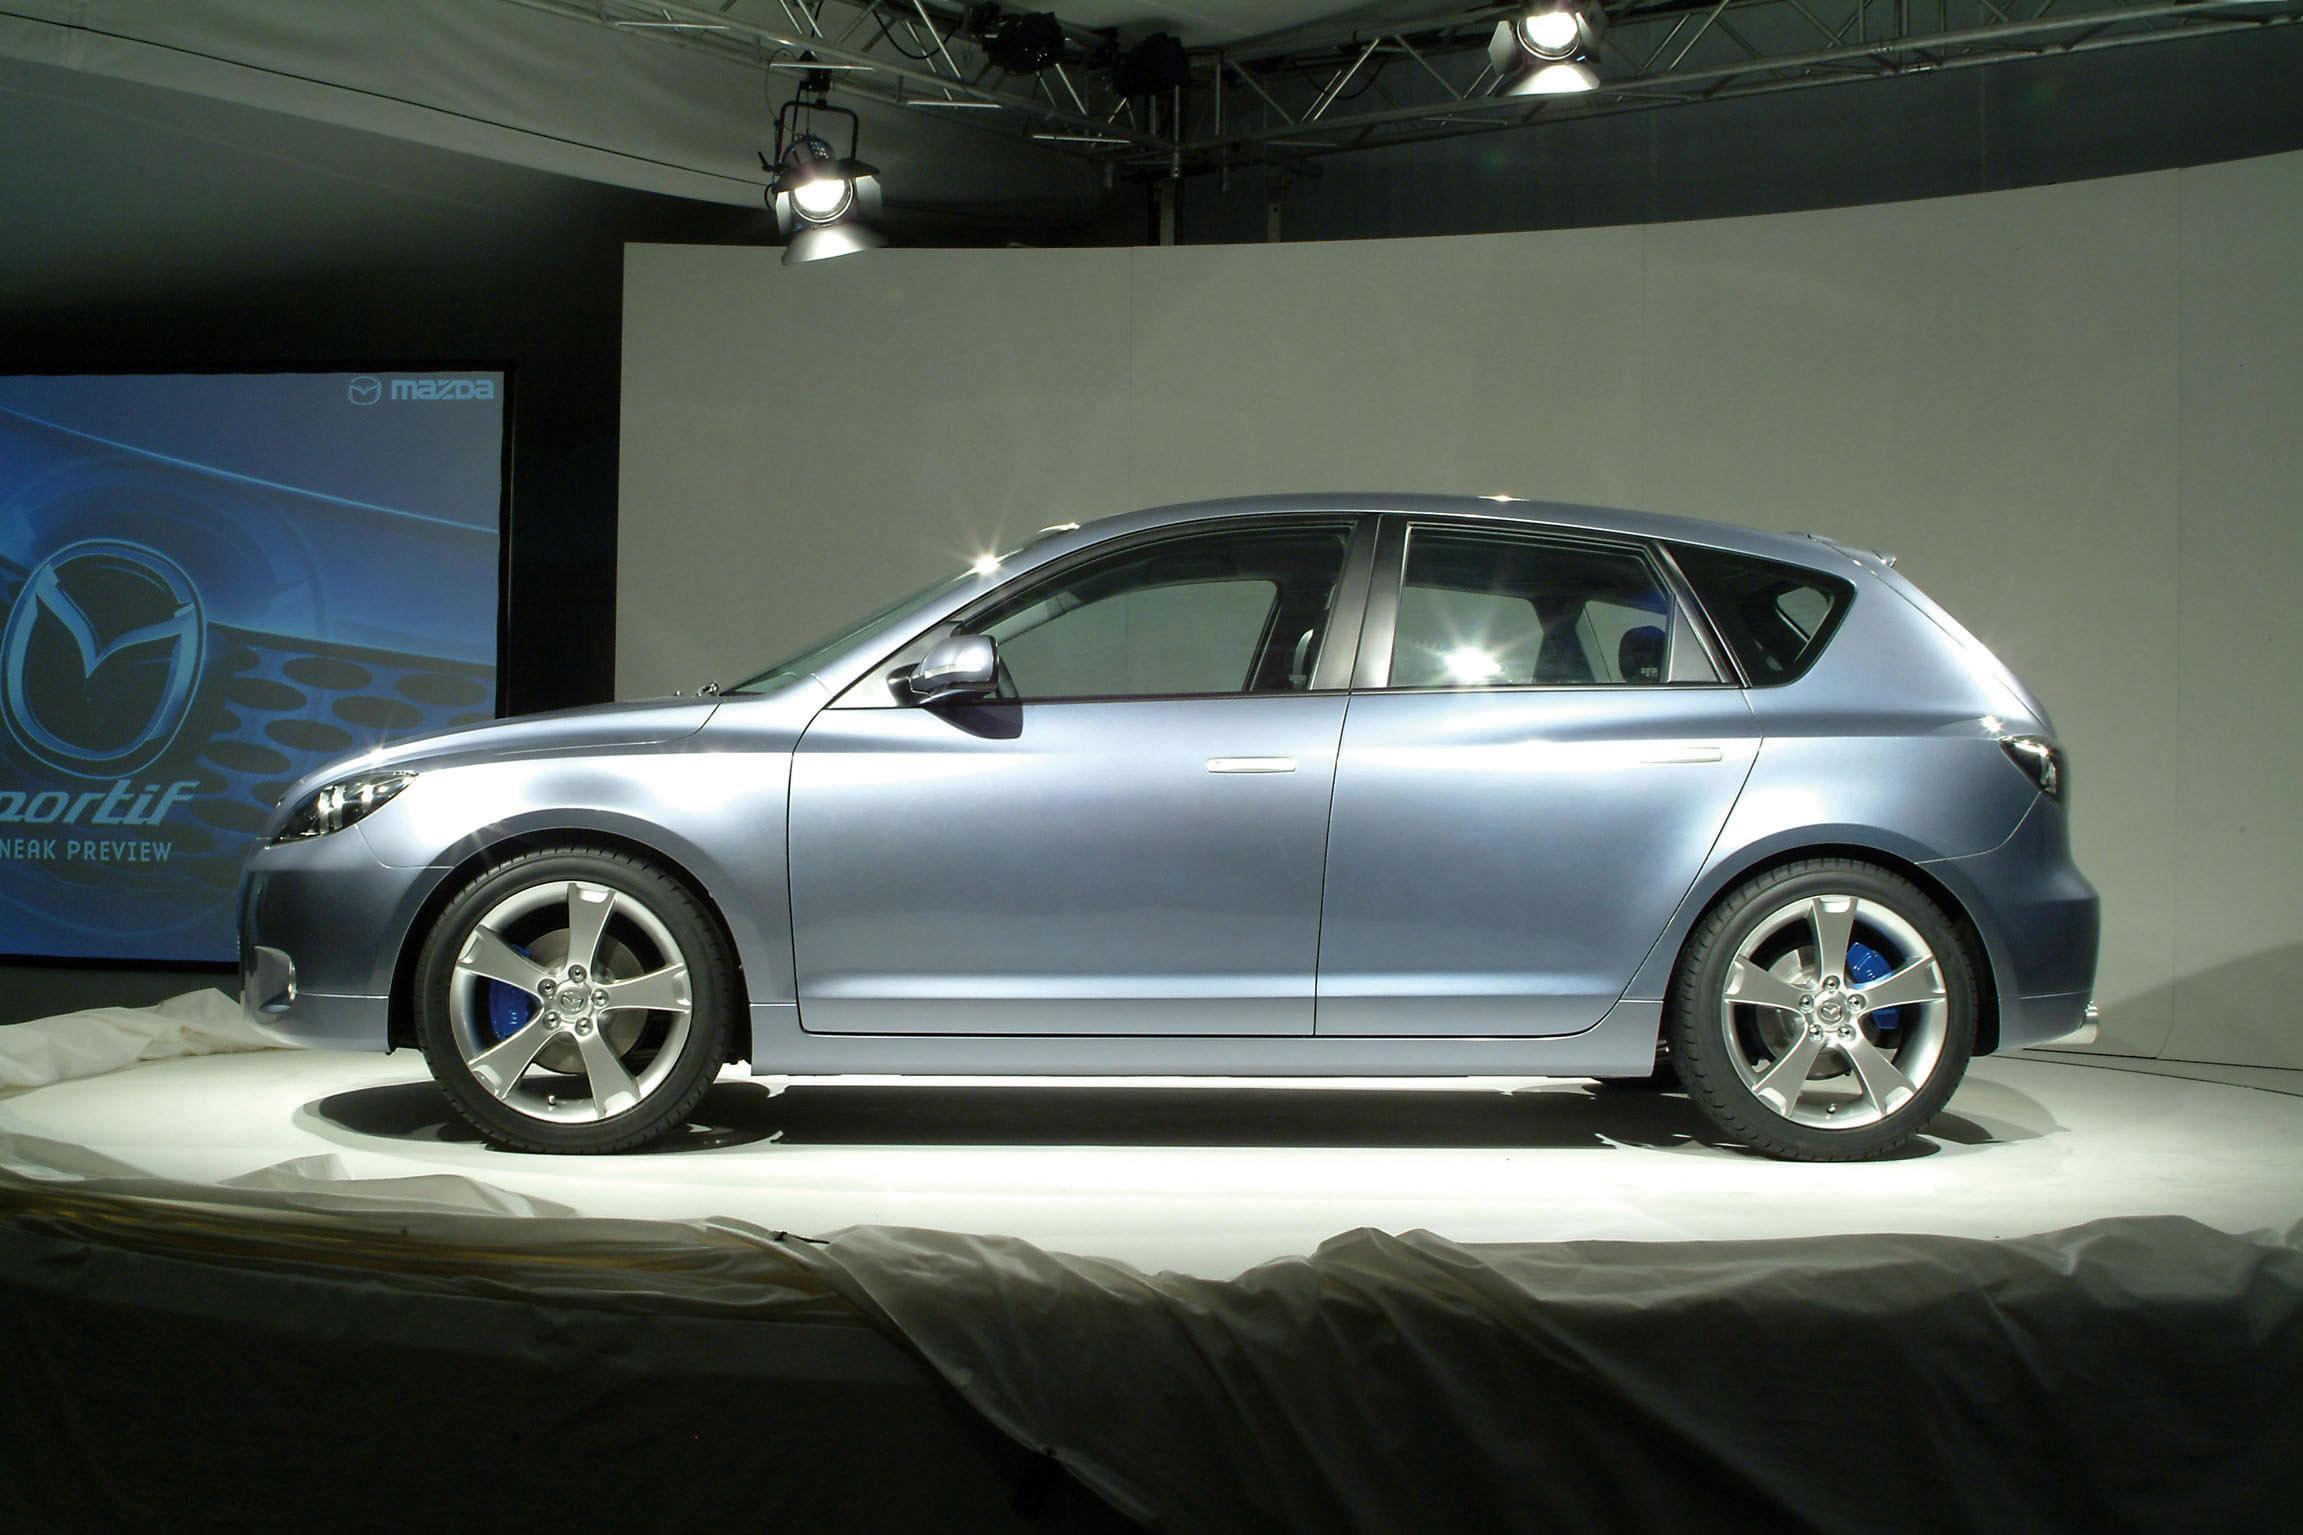 https://www.automobilesreview.com/gallery/2003-mazda-mx-sportif-concept/2003-mazda-mx-sportif-concept-18.jpg